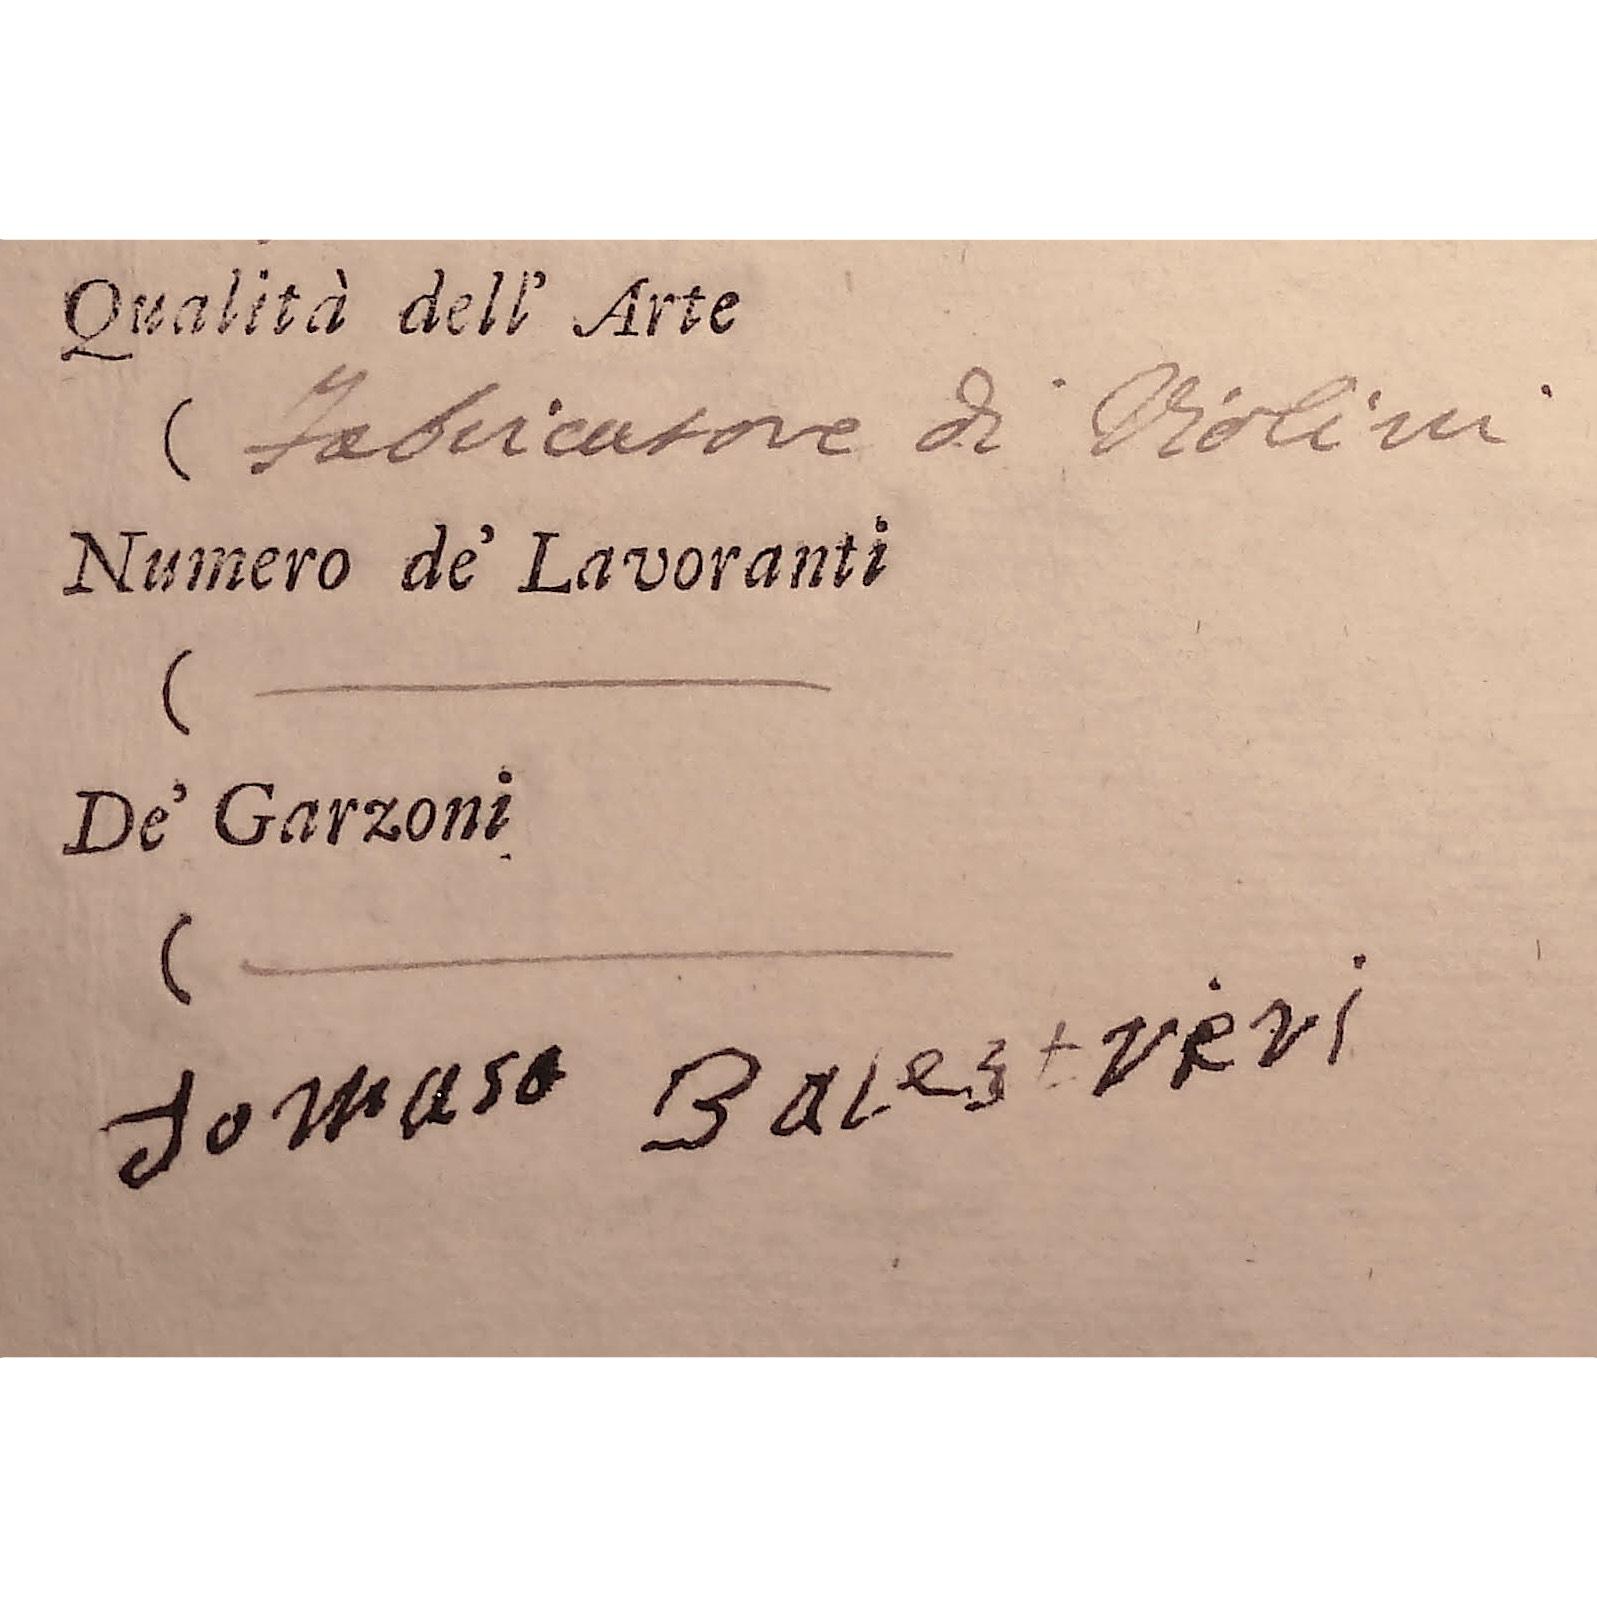 amera di Commercio bearing Balestrieri's name